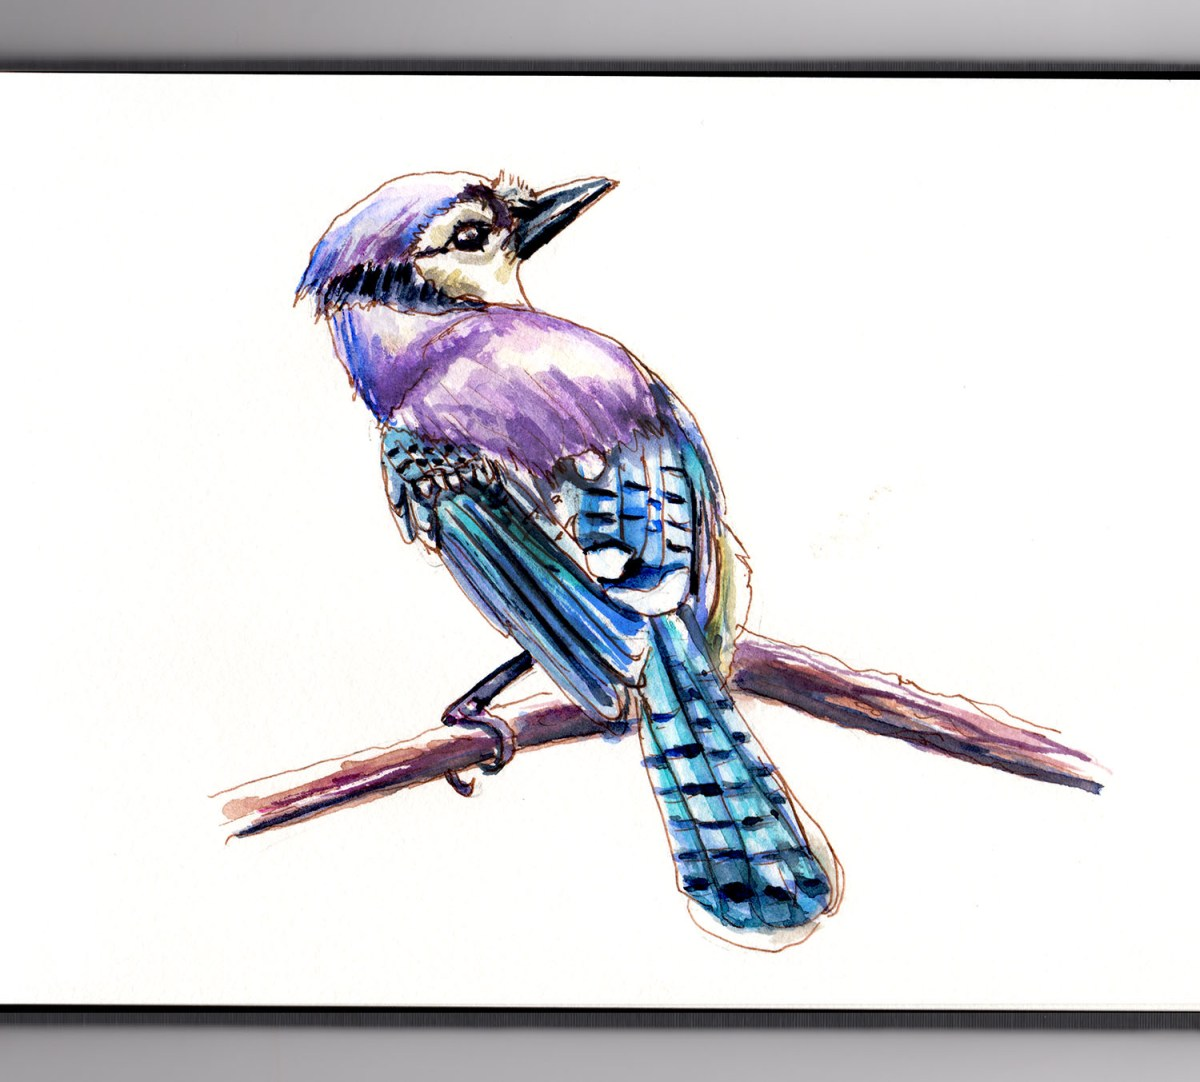 #WorldWatercolorGroup - Day 8 - Watching Birds - Bluejay - Doodlewash